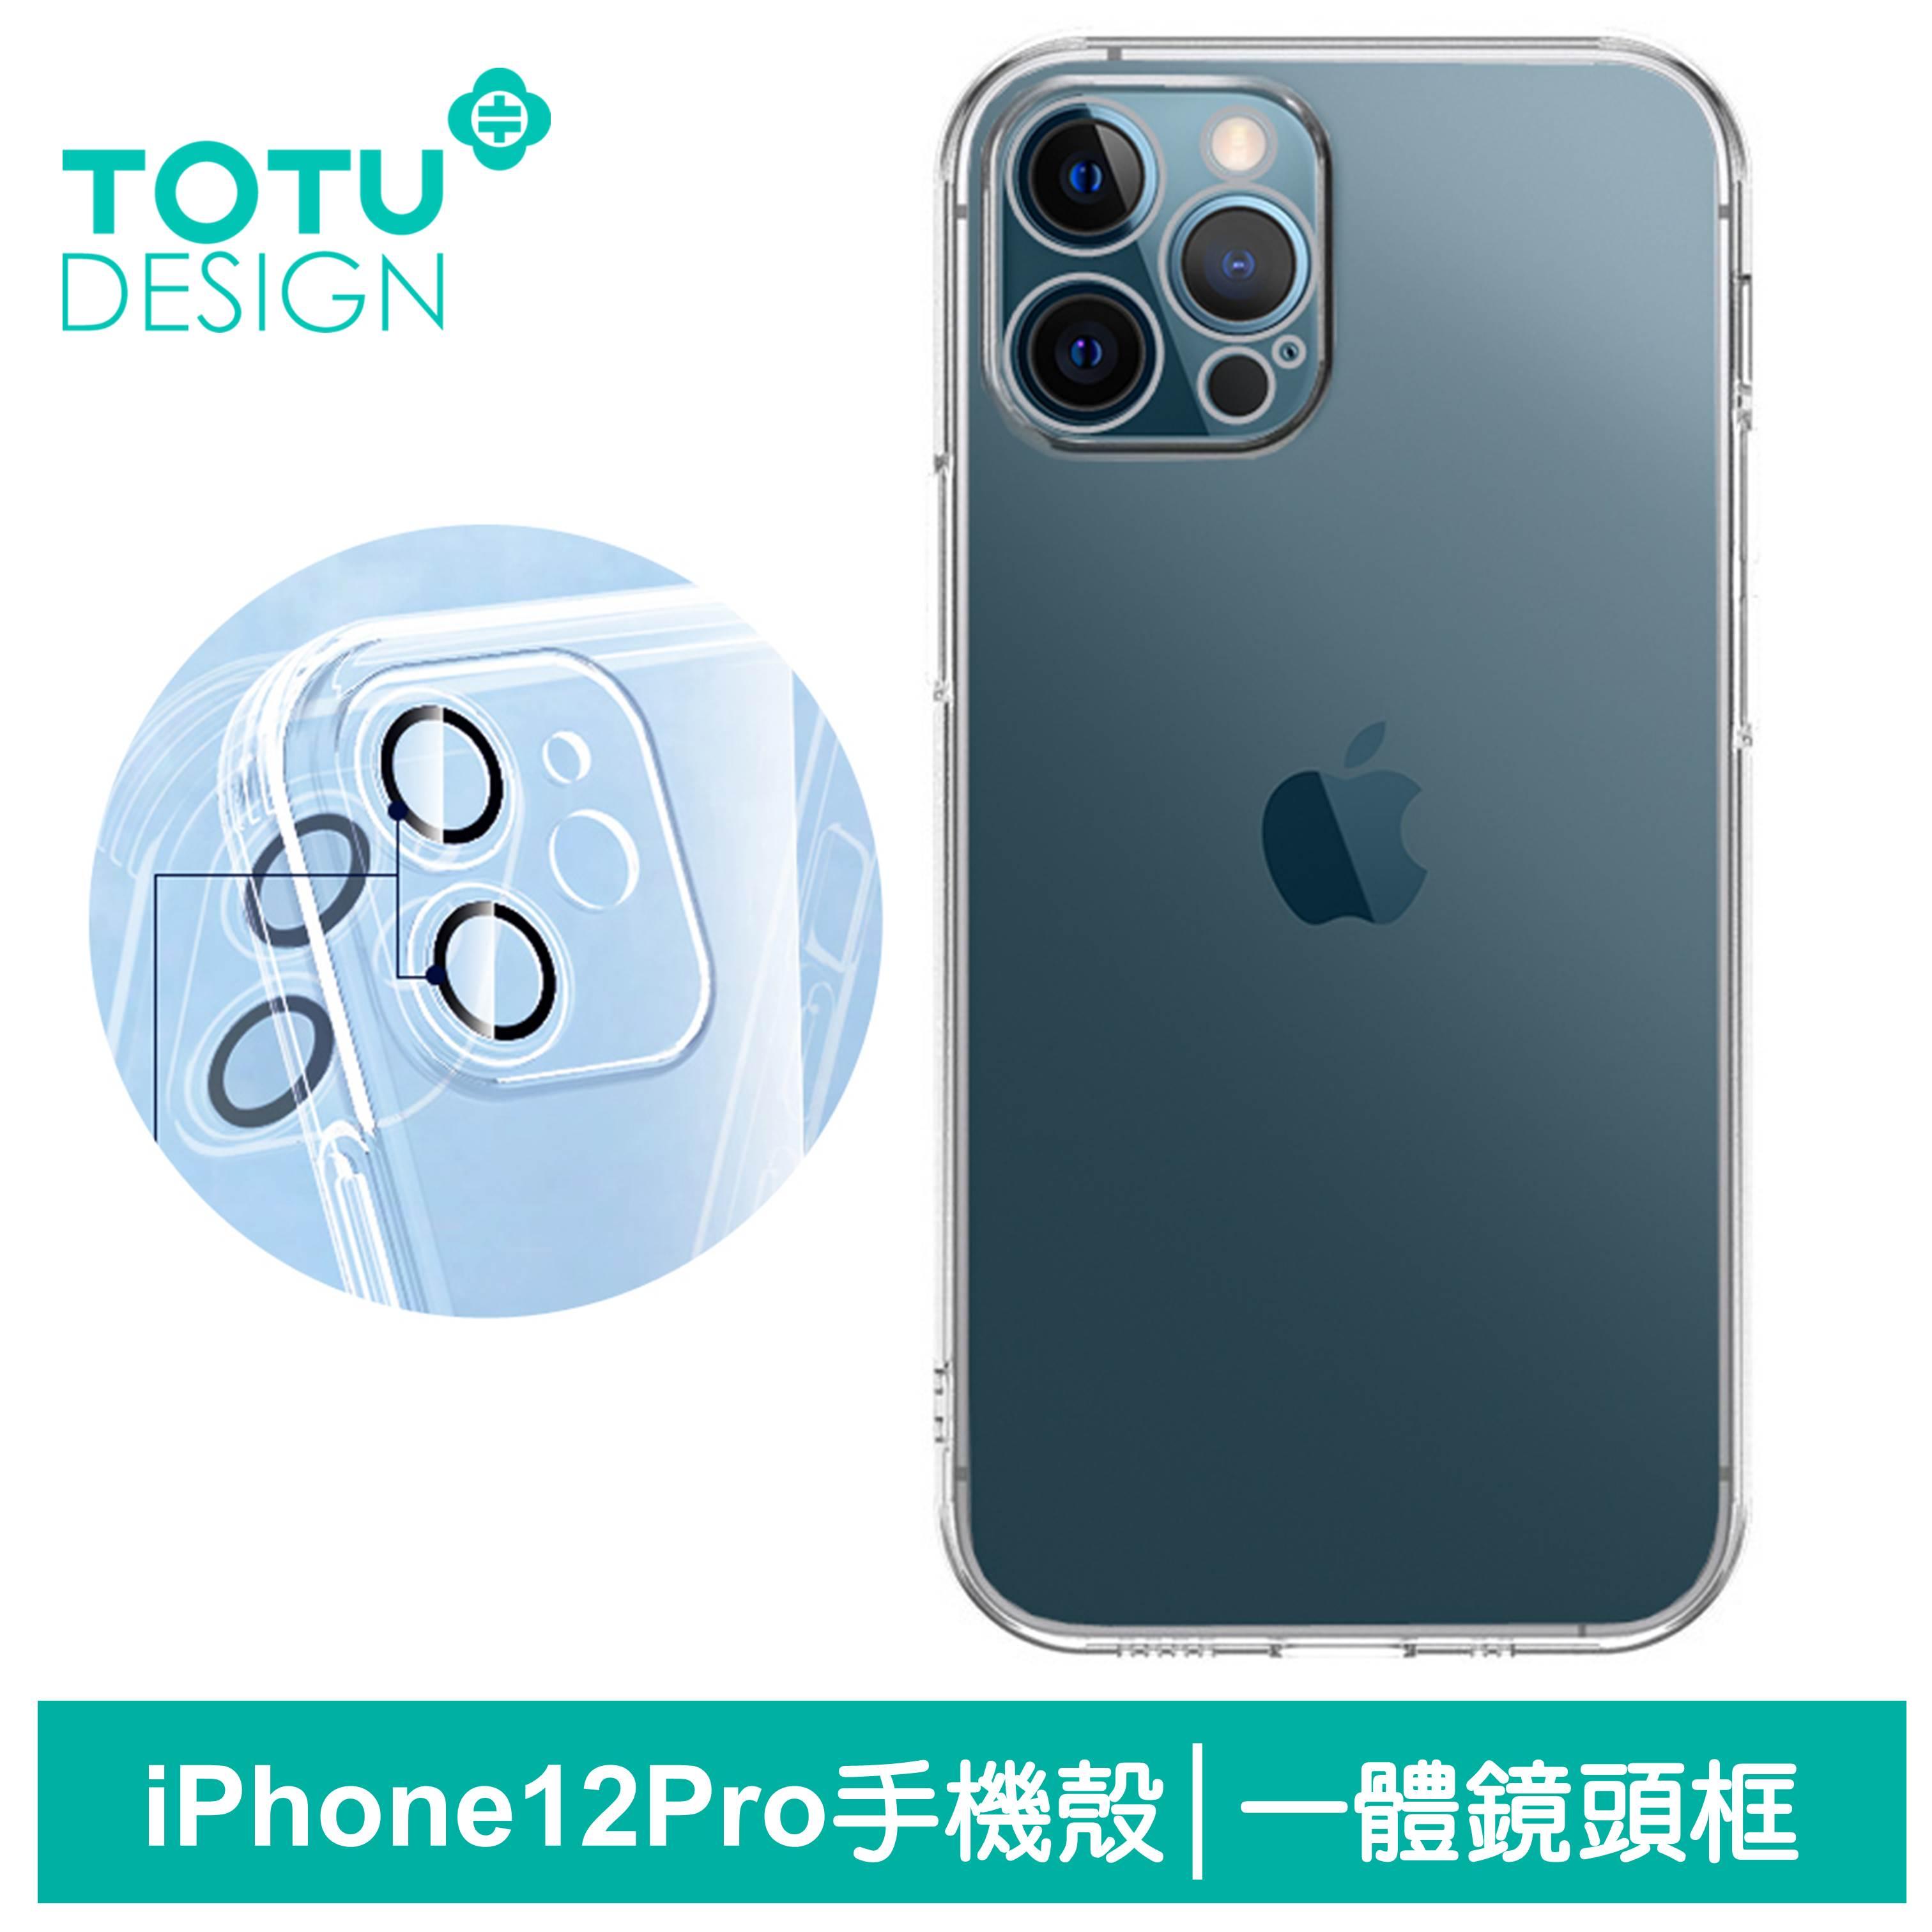 TOTU台灣官方 iPhone 12 Pro 手機殼 i12 Pro 保護殼 6.1吋 防摔殼 軟殼 一體鏡頭框 柔精裝 透明